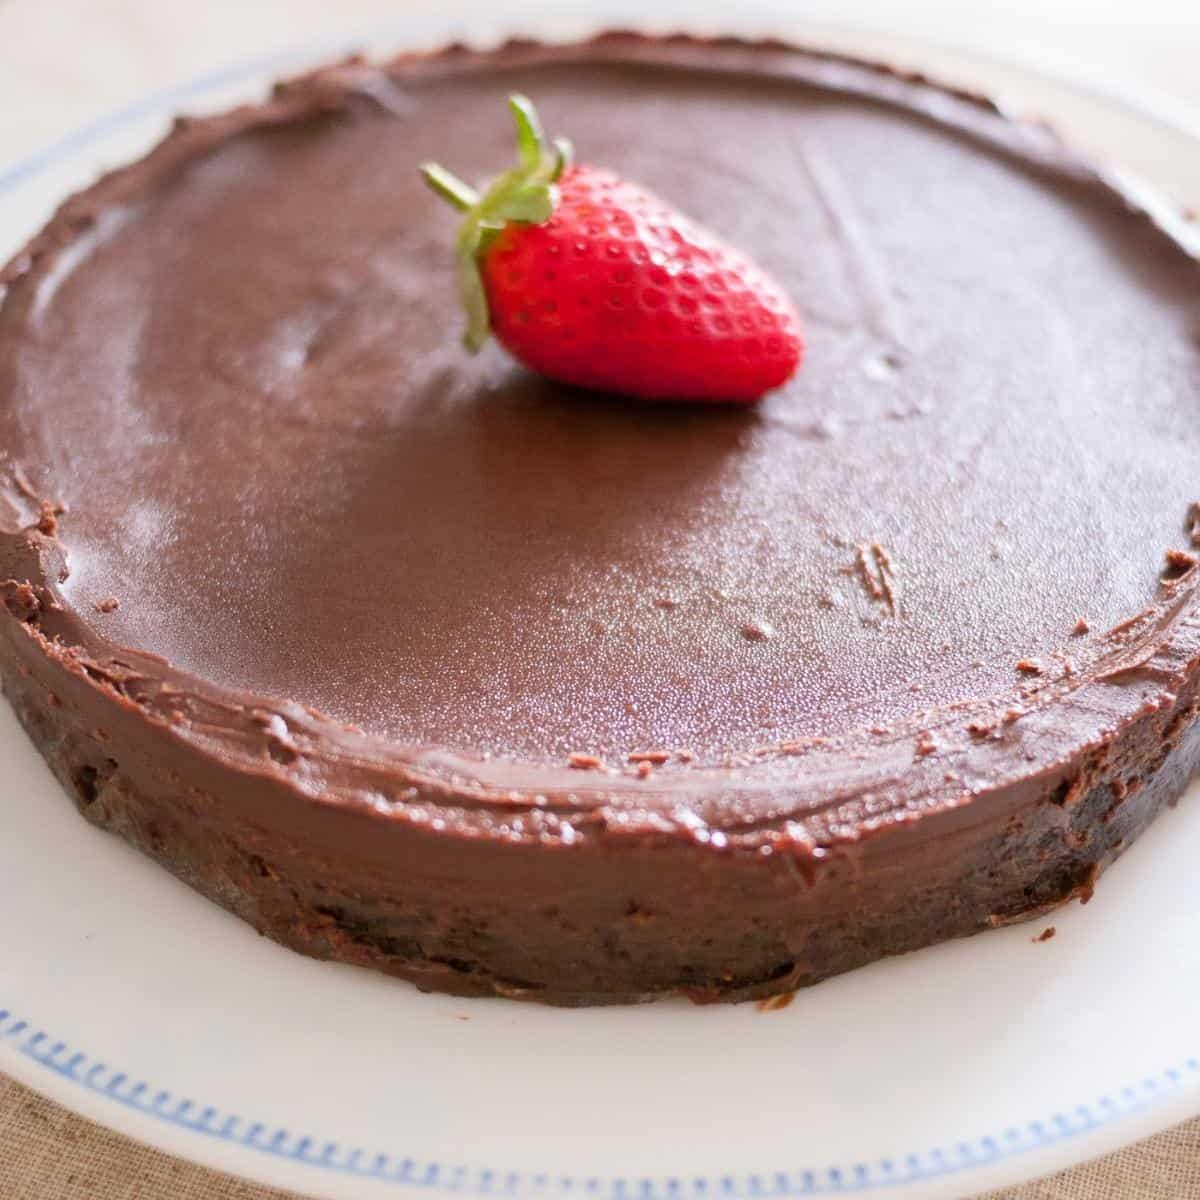 Flourless chocolate cake on a plate.